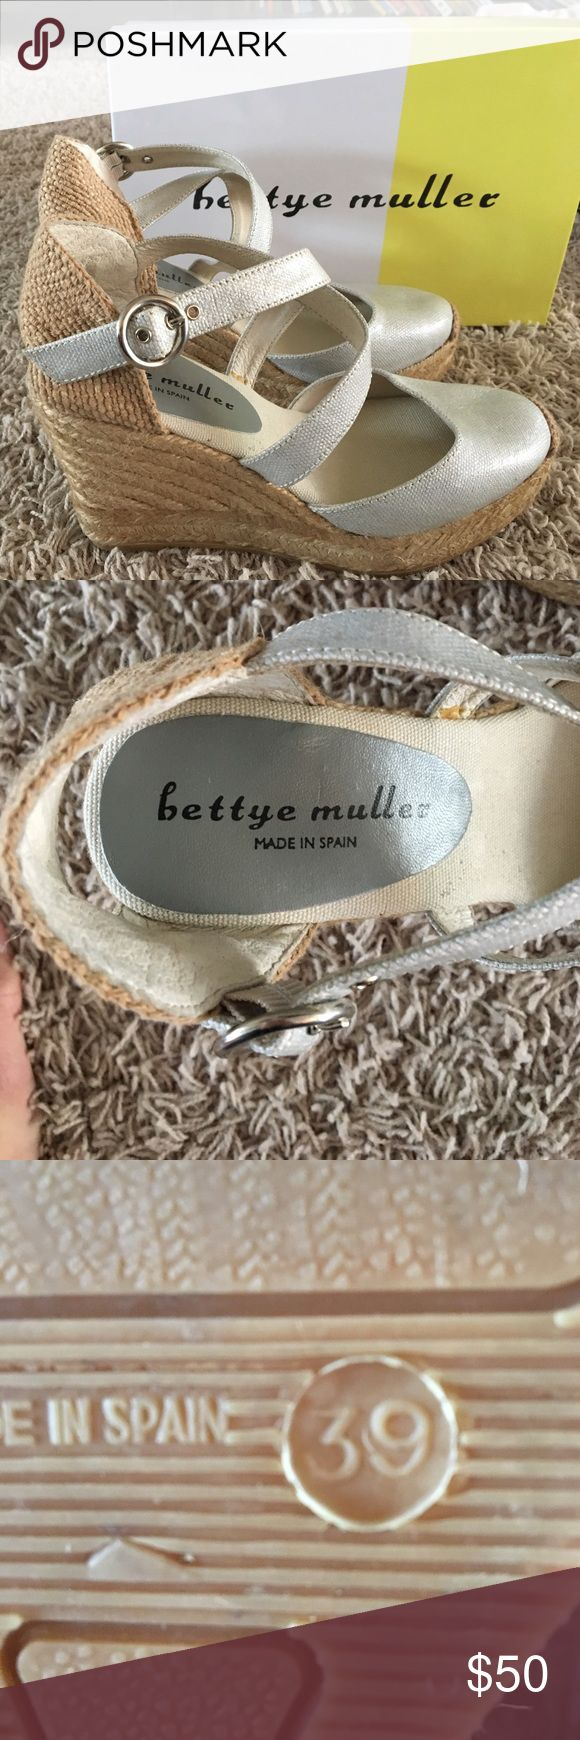 Bettye Muller Katy Bis platform Espadrilles About 3.5 inch heel. Platinum color. Seychelles Shoes Platforms